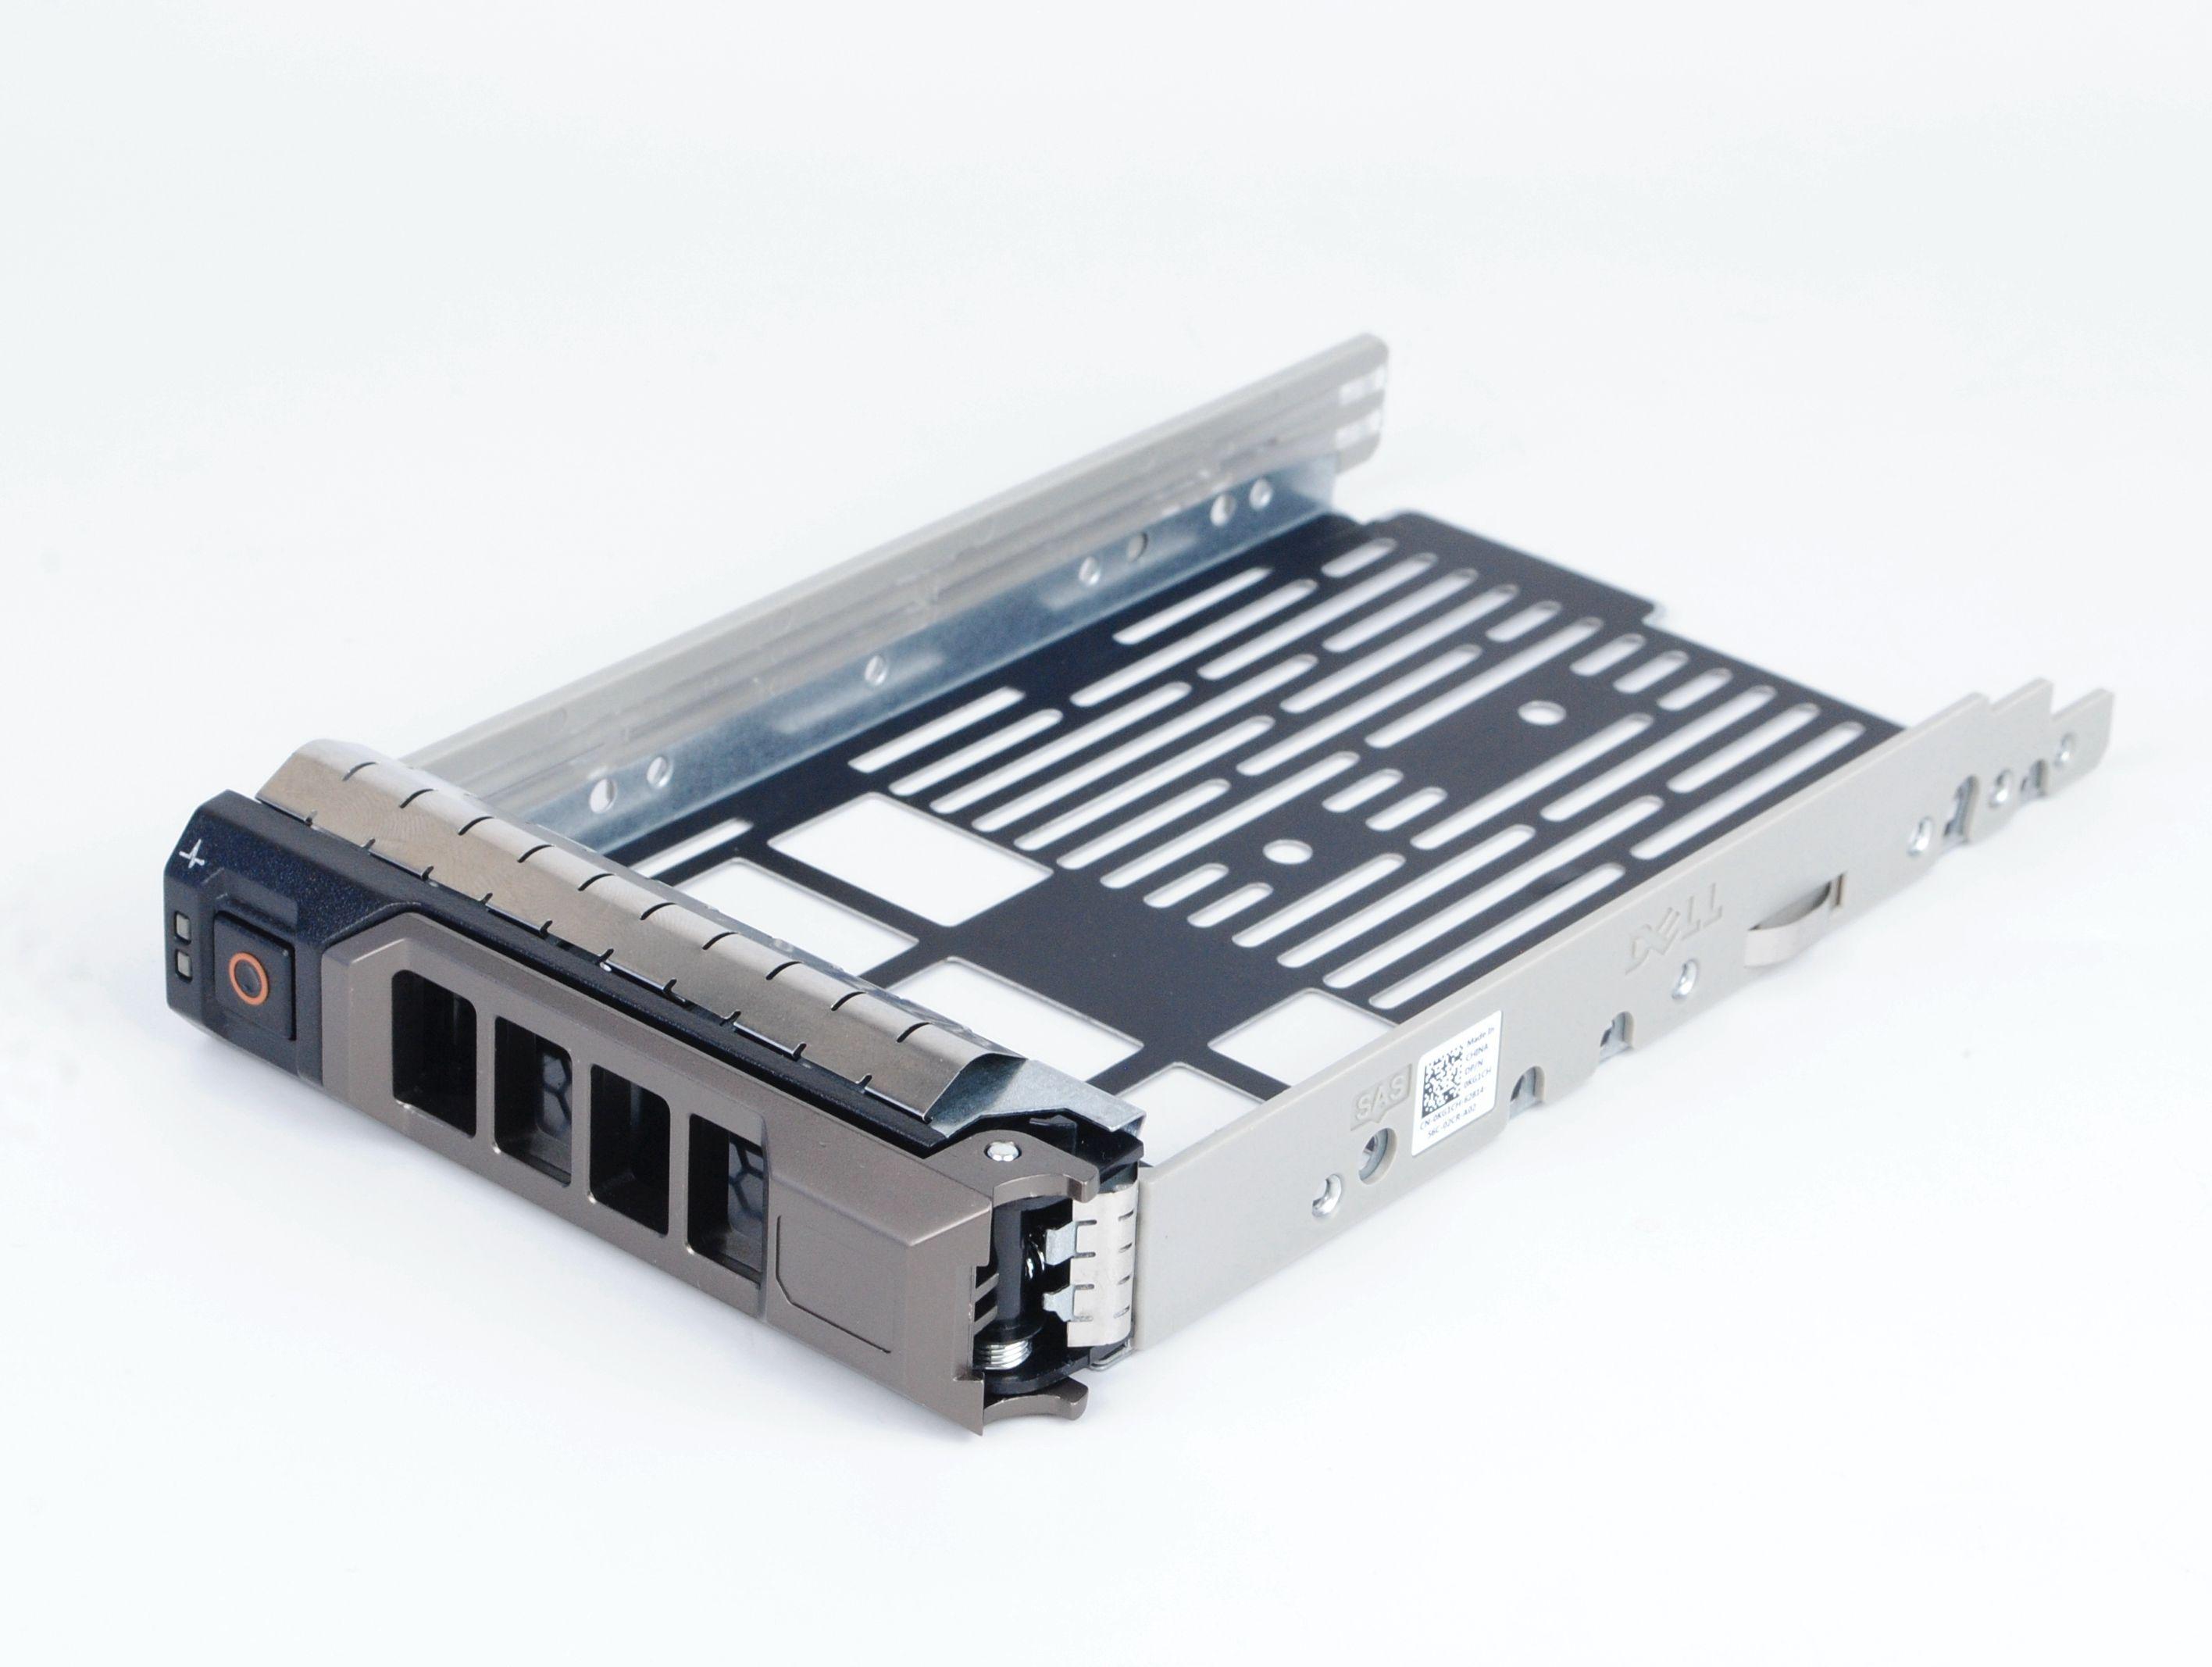 "KG1CH 0KG1CH disque dur 3.5"" Plateau Caddy pour Dell PowerEdge R515 R710 R320 R420 R520 R720 R720xd T320 T420 T620"